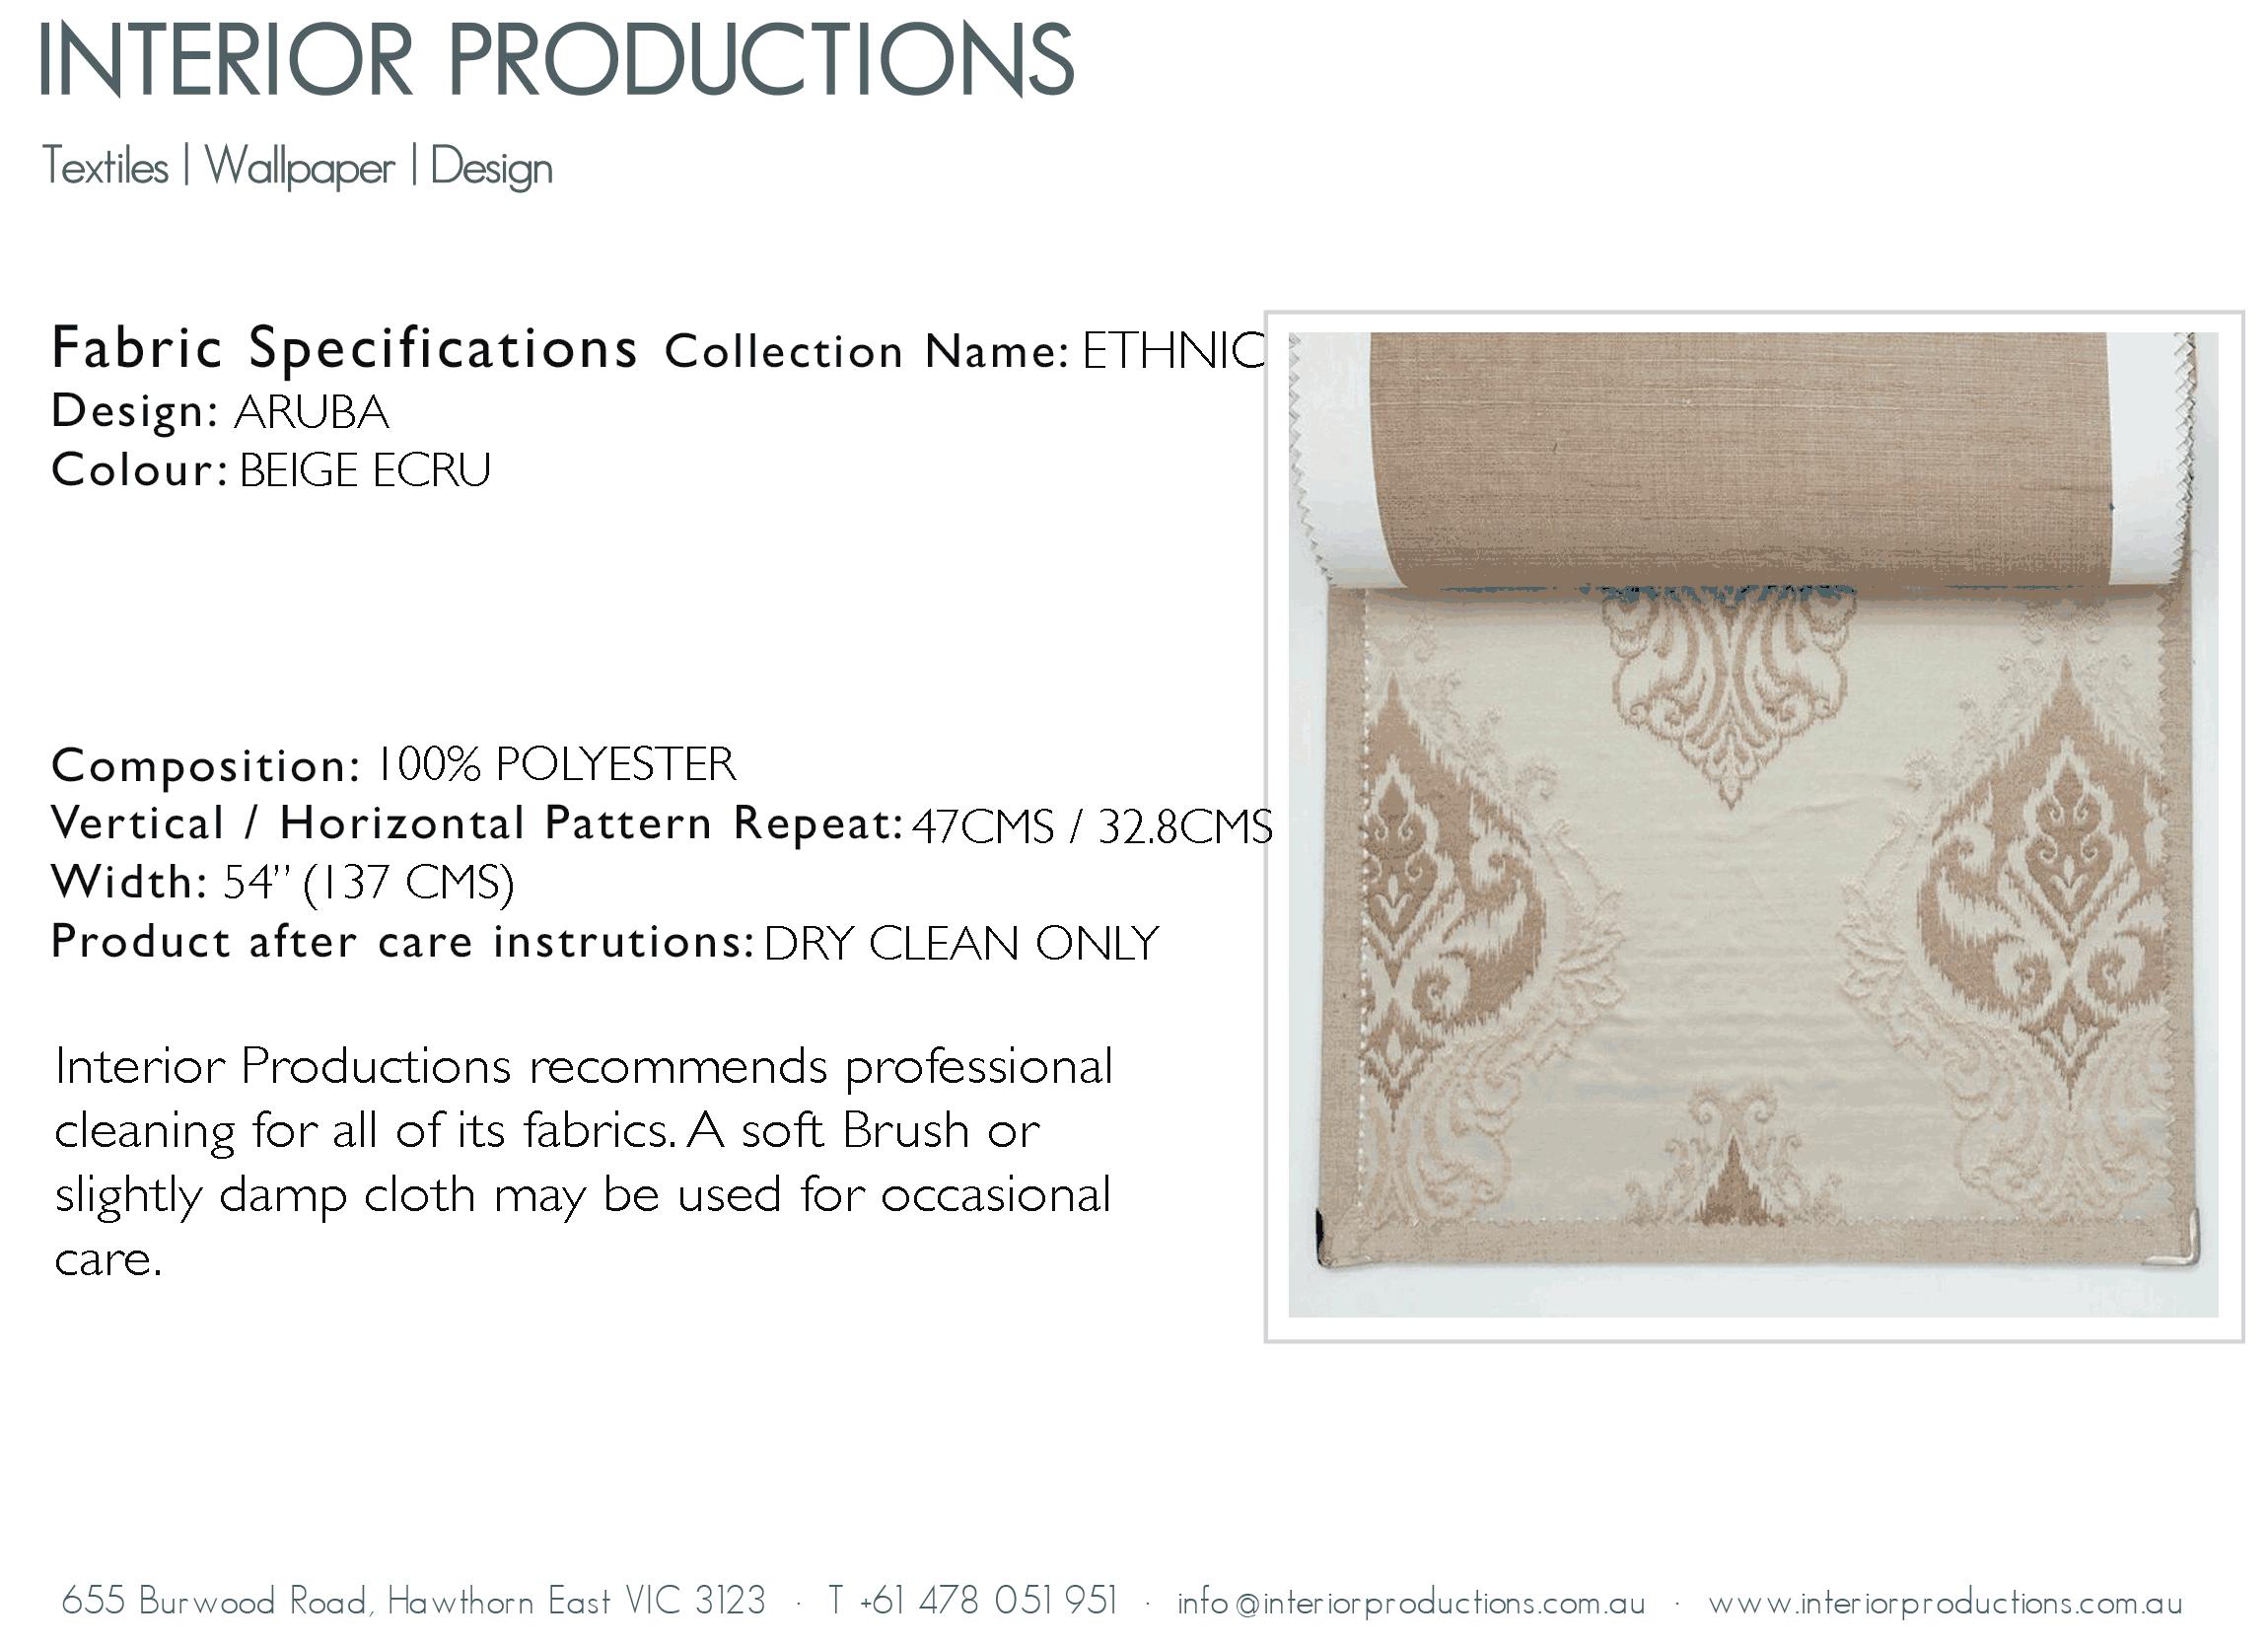 interior_productions_ARUBA---BEIGE-ECRU